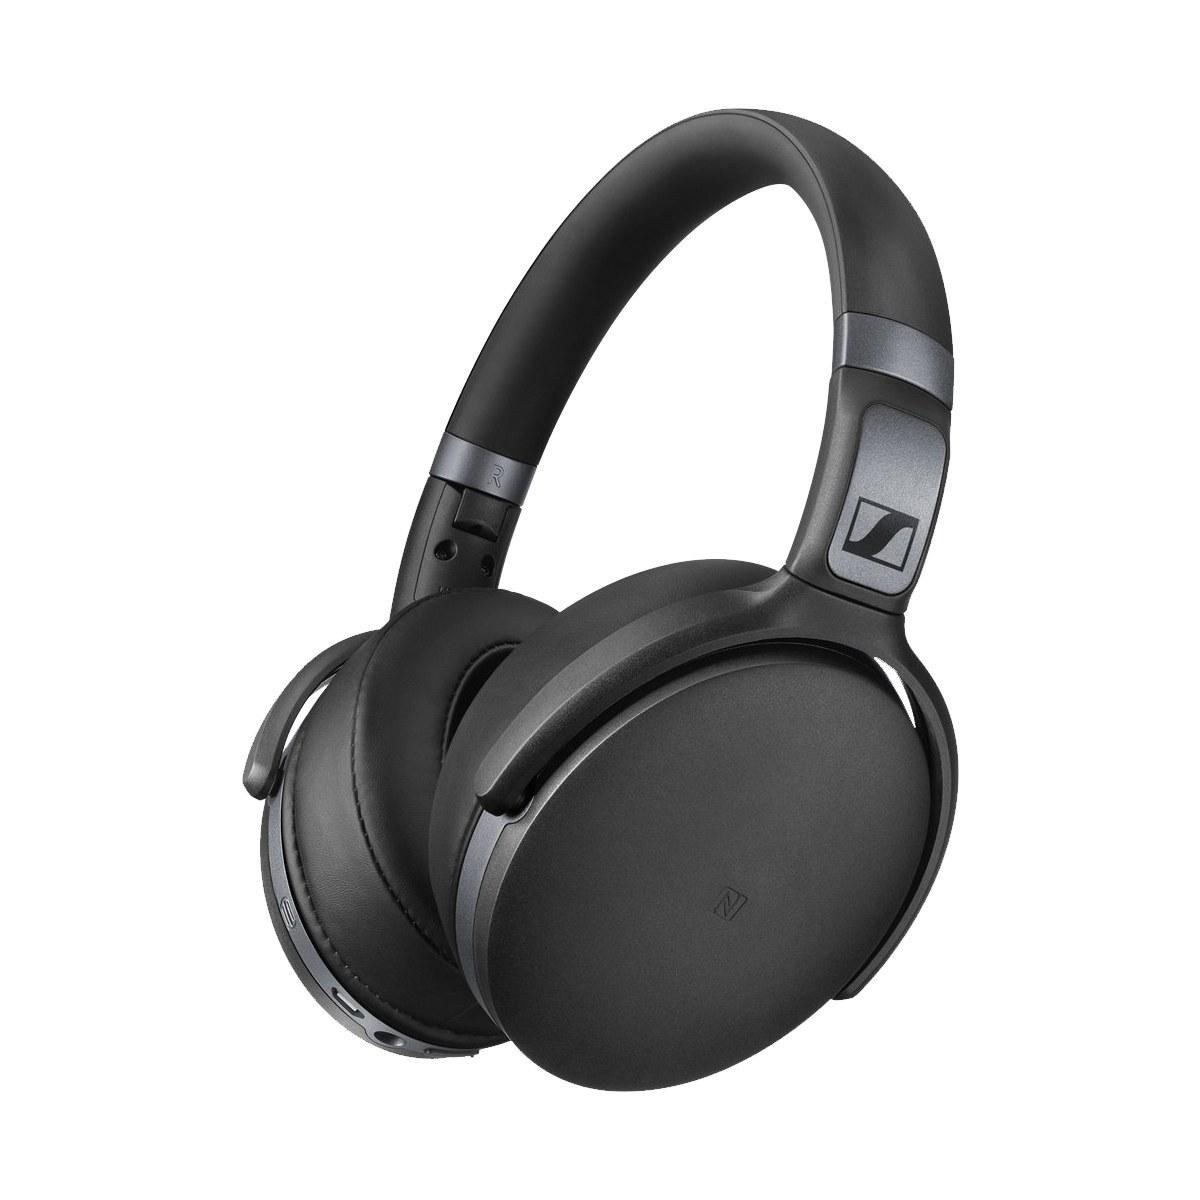 عکس هدفون سنهایزر مدل HD 4.40 BT Sennheiser HD 4.40 BT i Headphone هدفون-سنهایزر-مدل-hd-440-bt